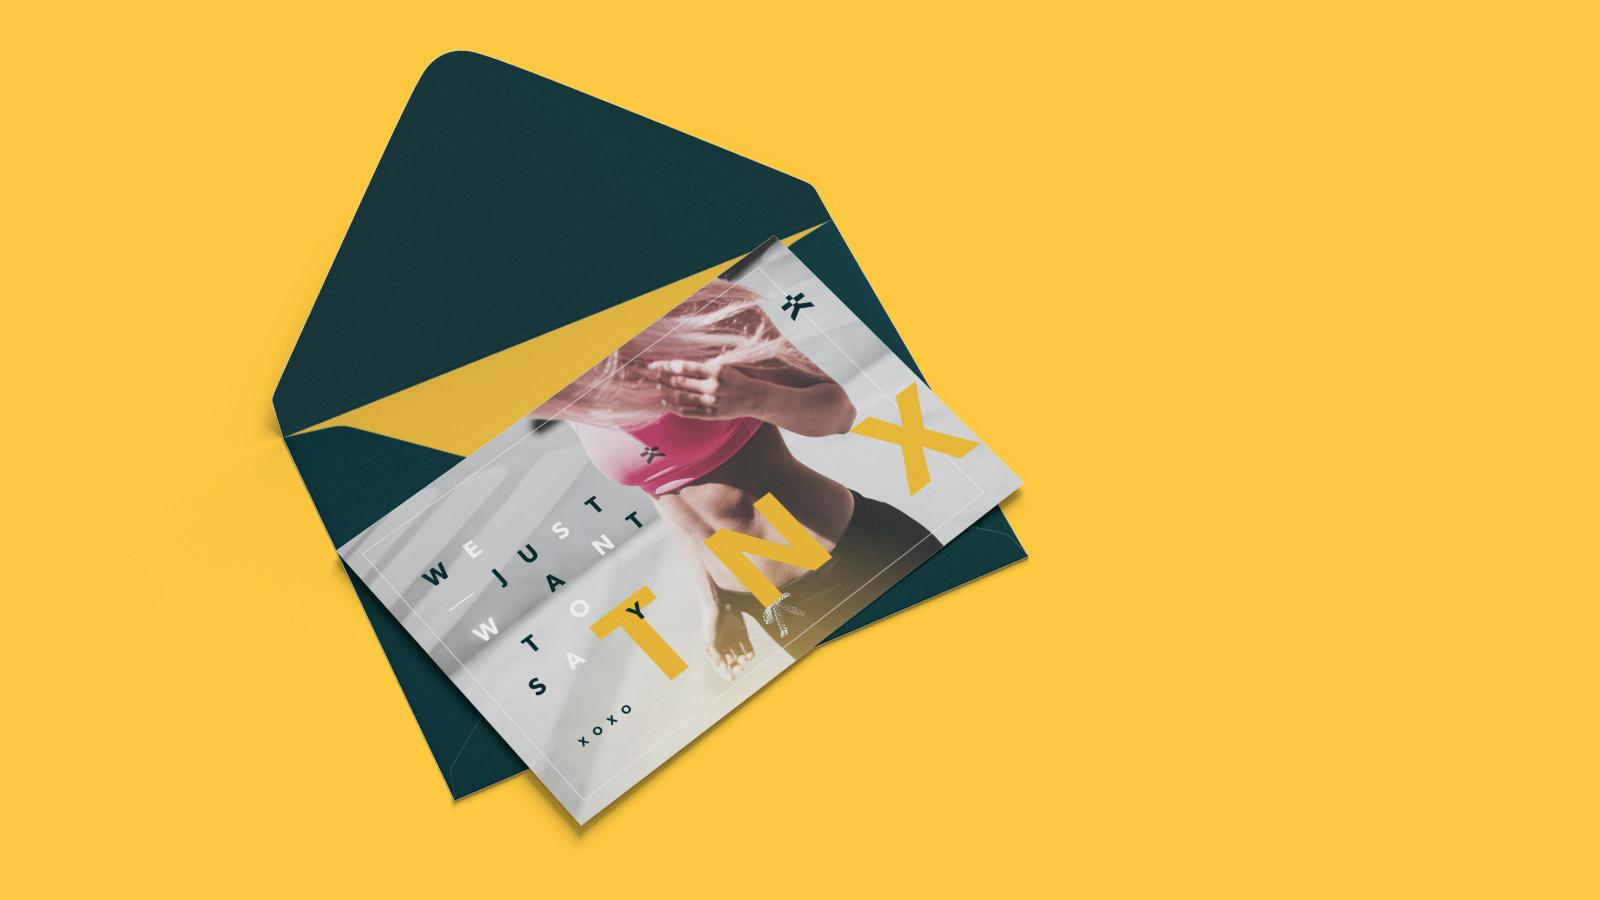 Liky's_TnxPostcard_2.jpg